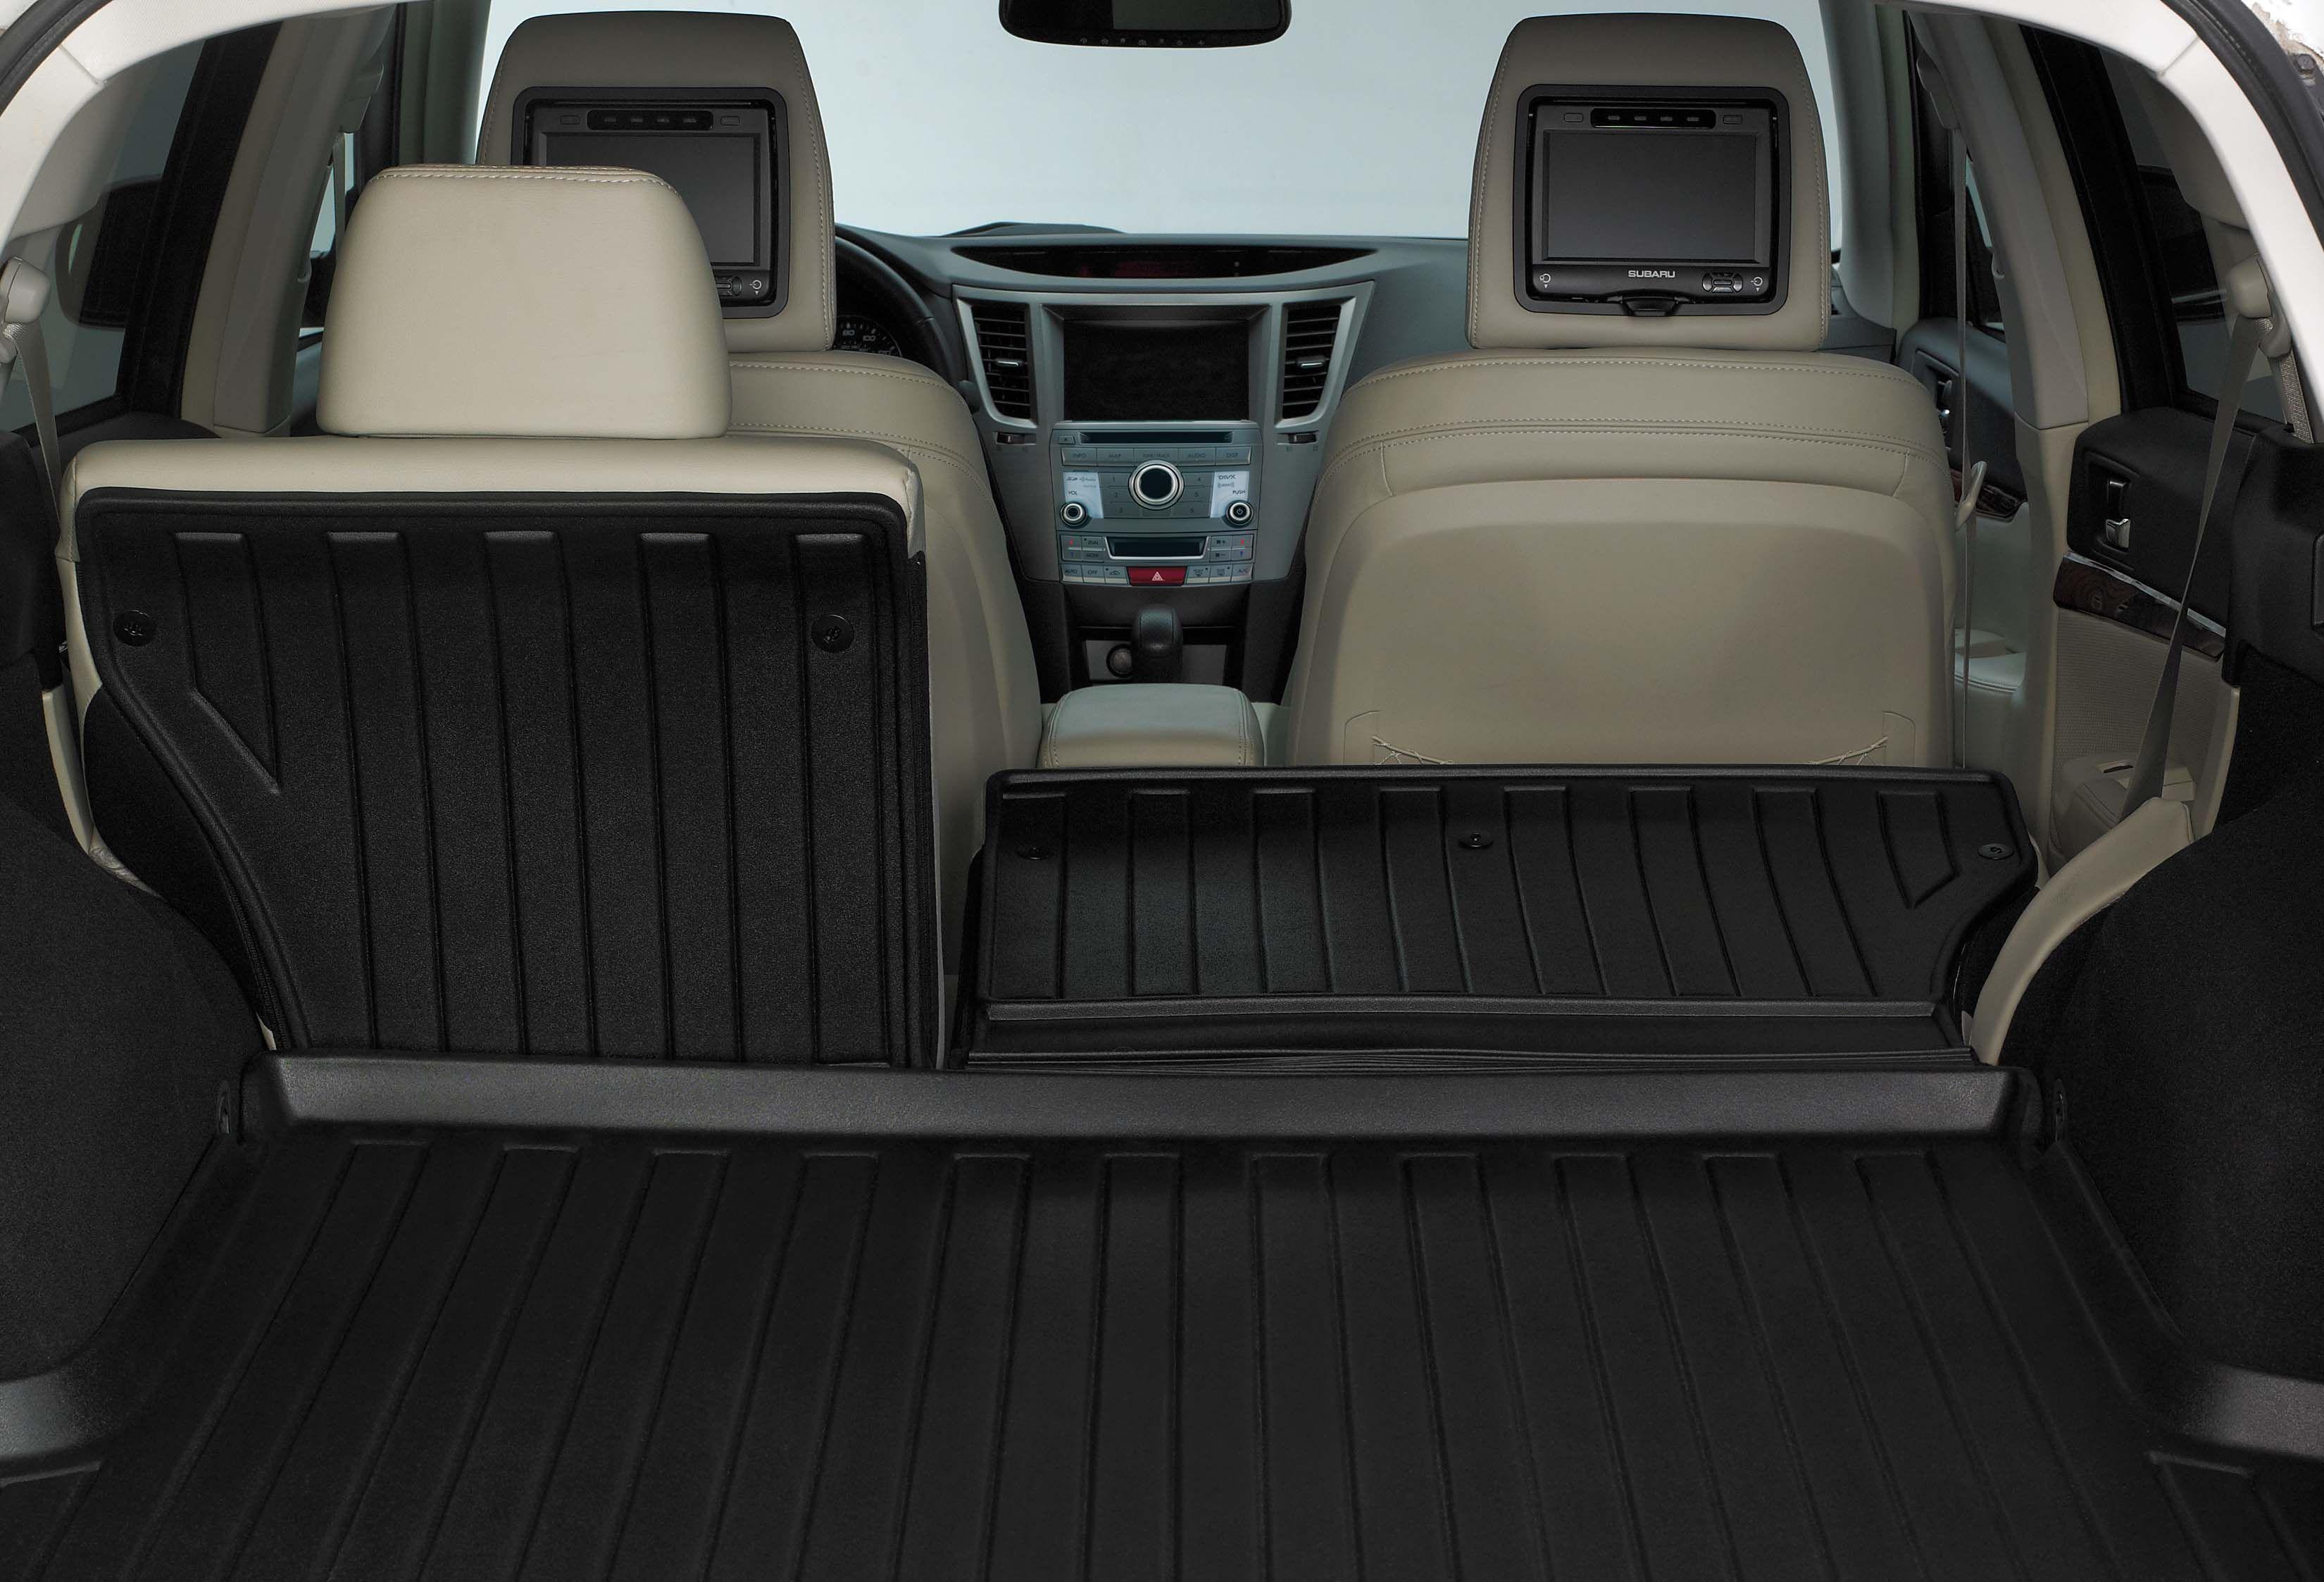 2017 Subaru Outback J501saj600 Rear Seat Back Protector